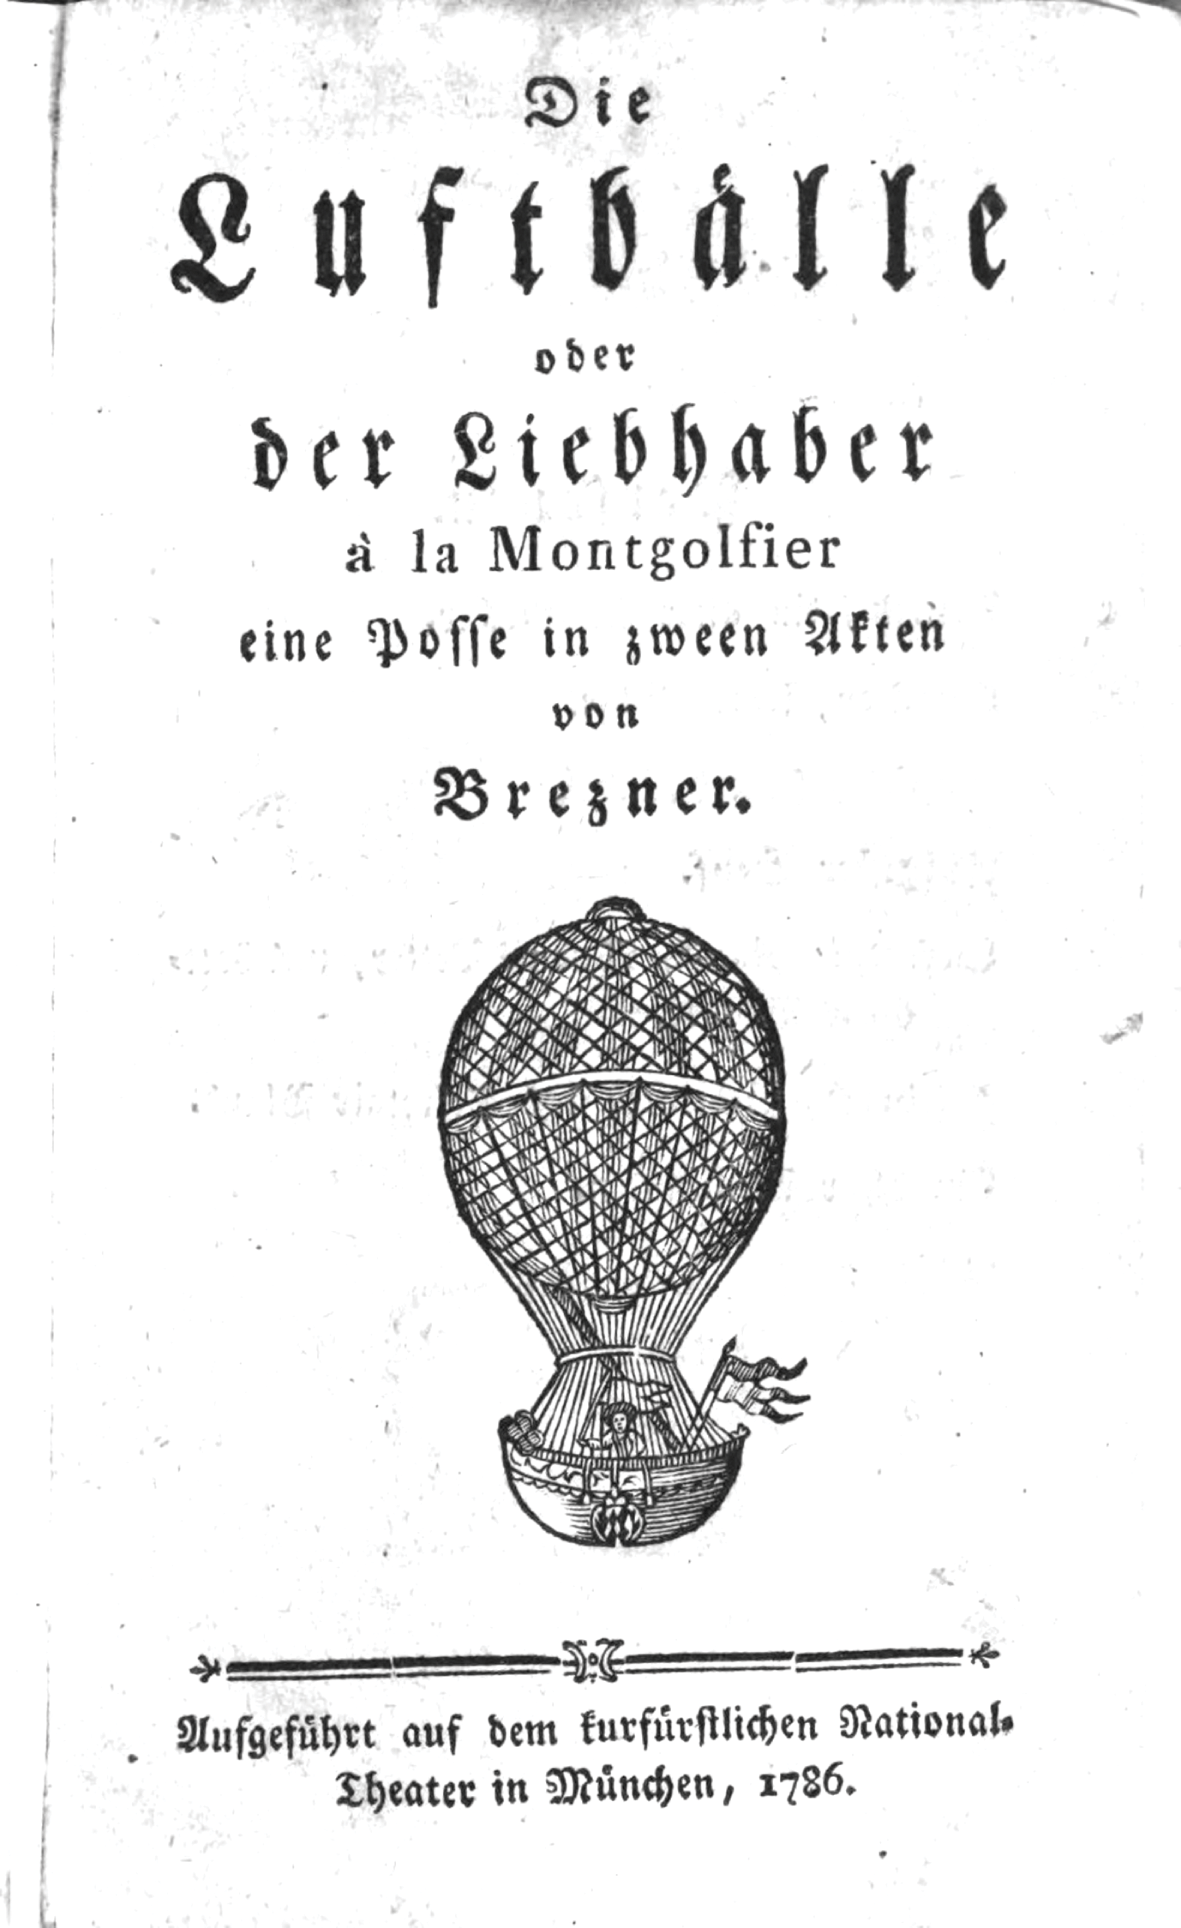 Technologies (Part III) - Nineteenth-Century Opera and the